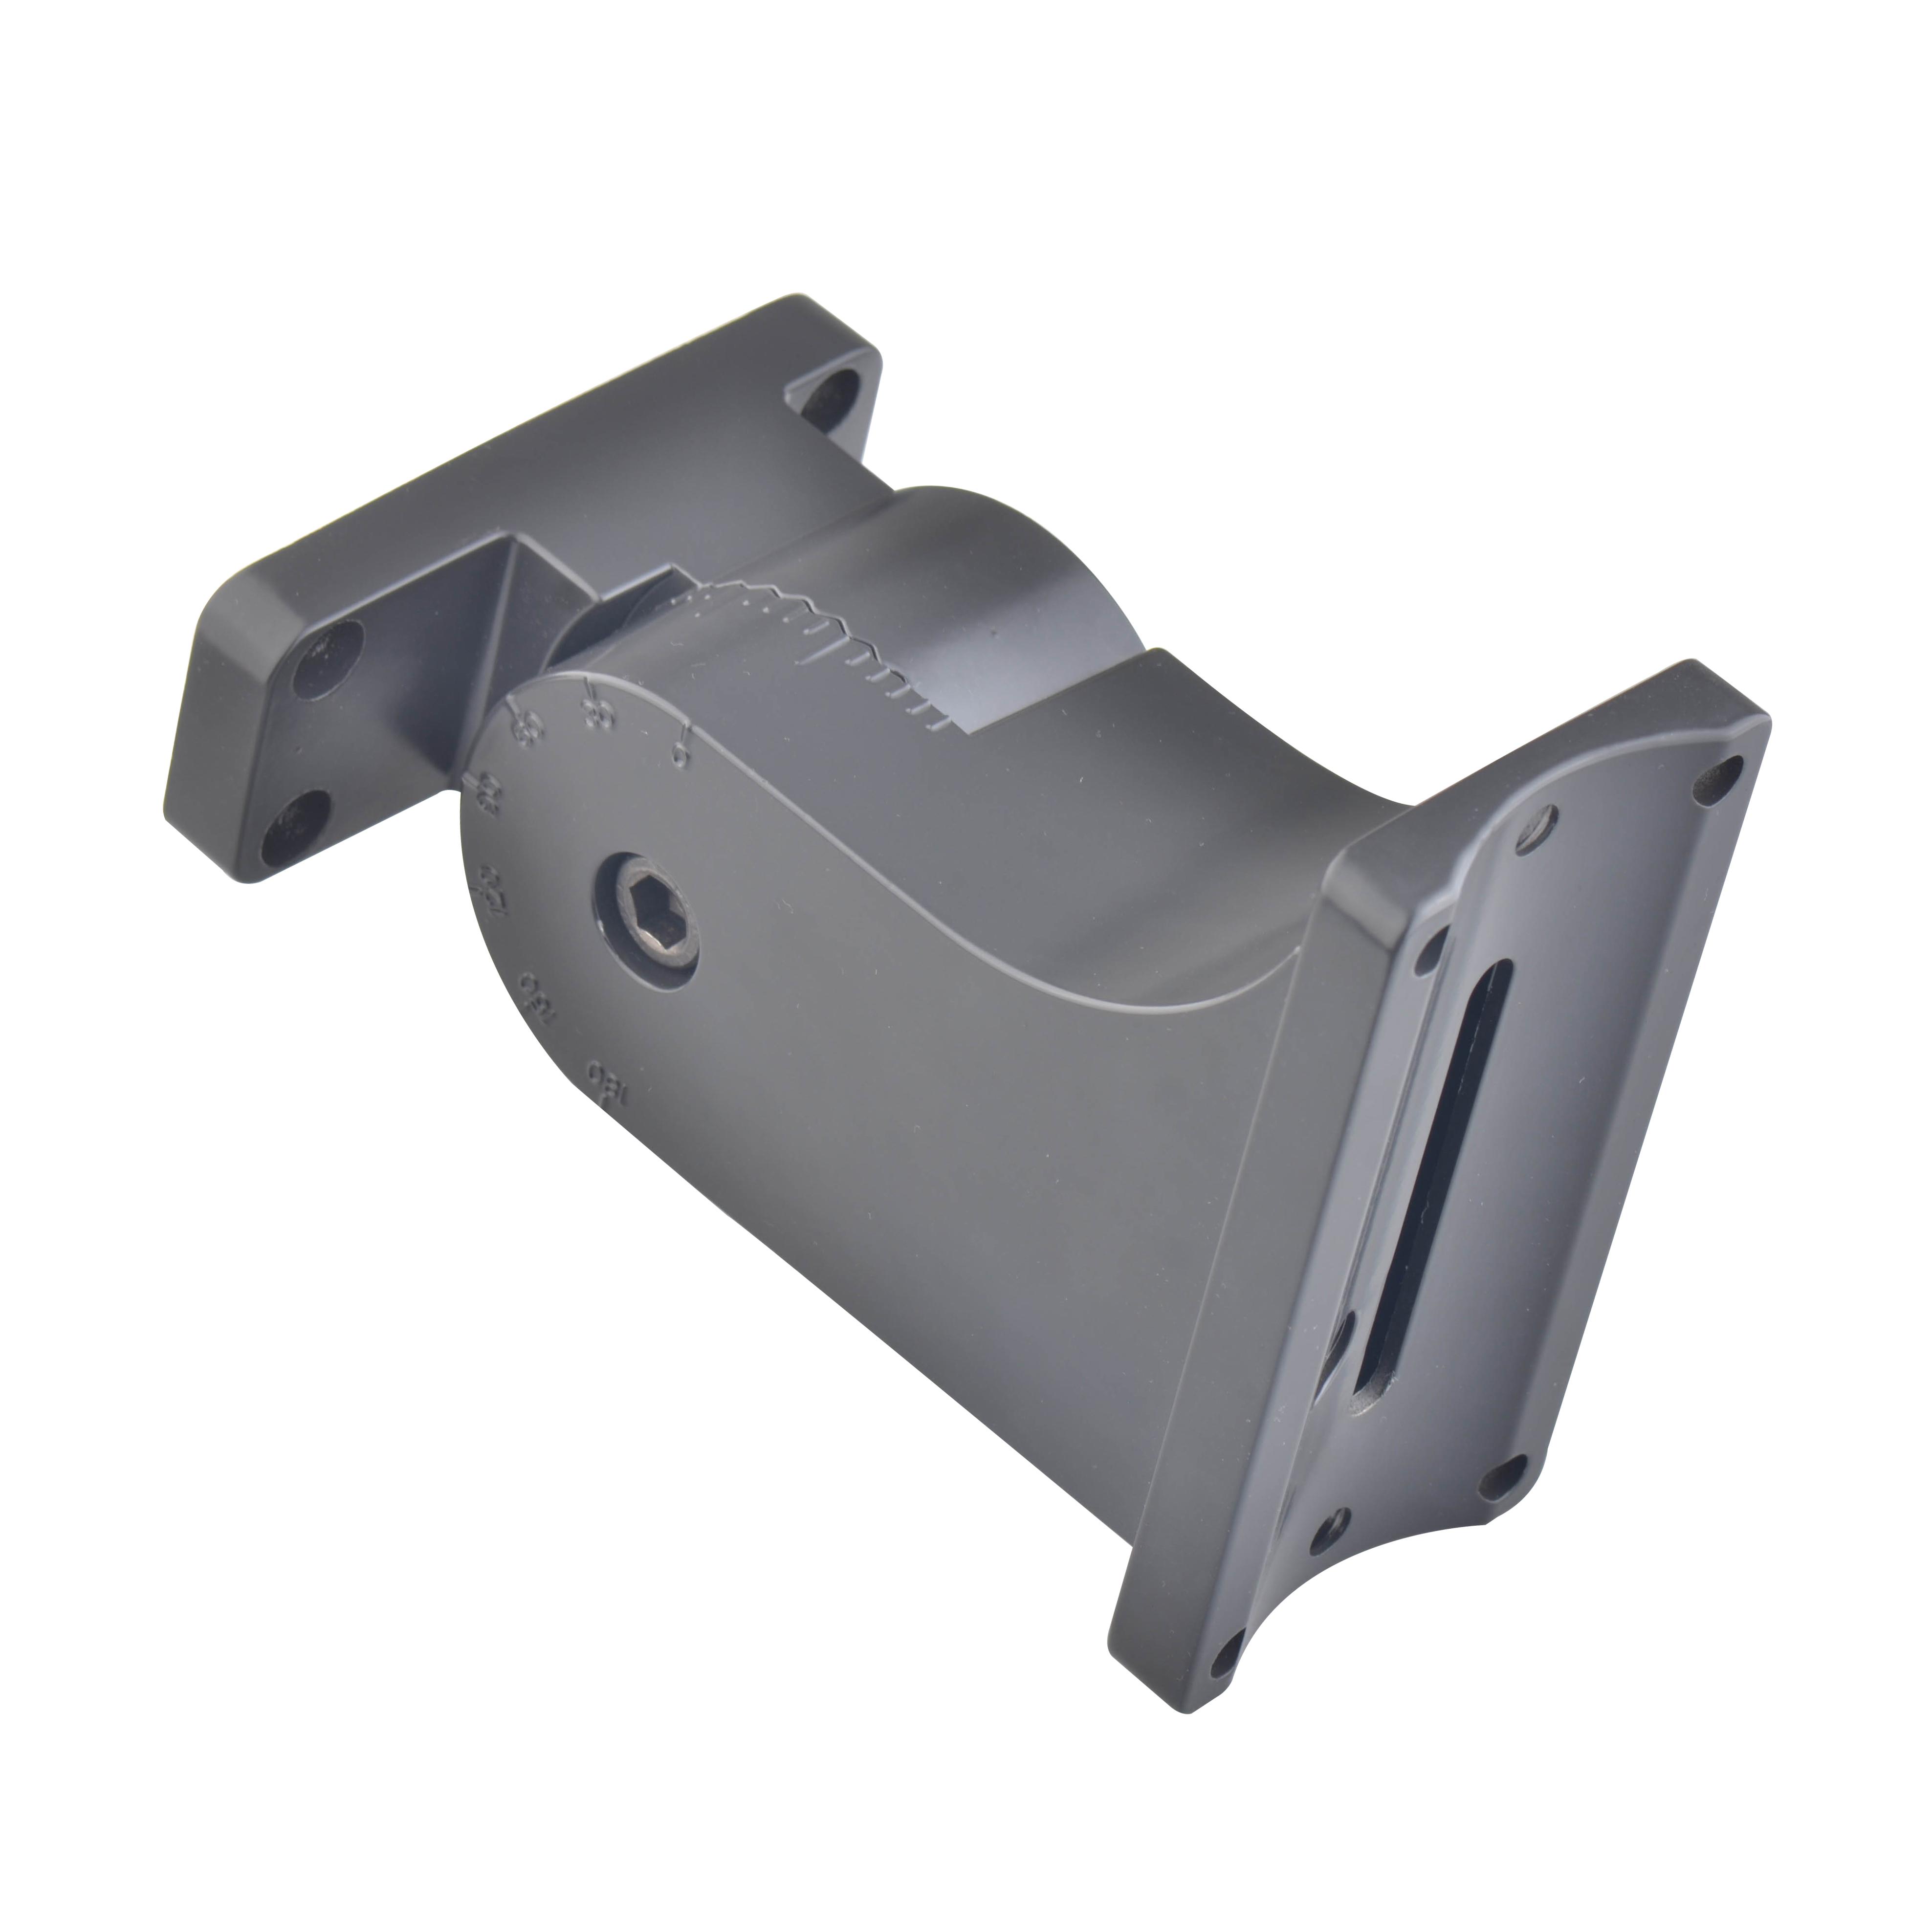 320w Shoebox Led Light Fixture 1000w Mh Equivalent 39000lm